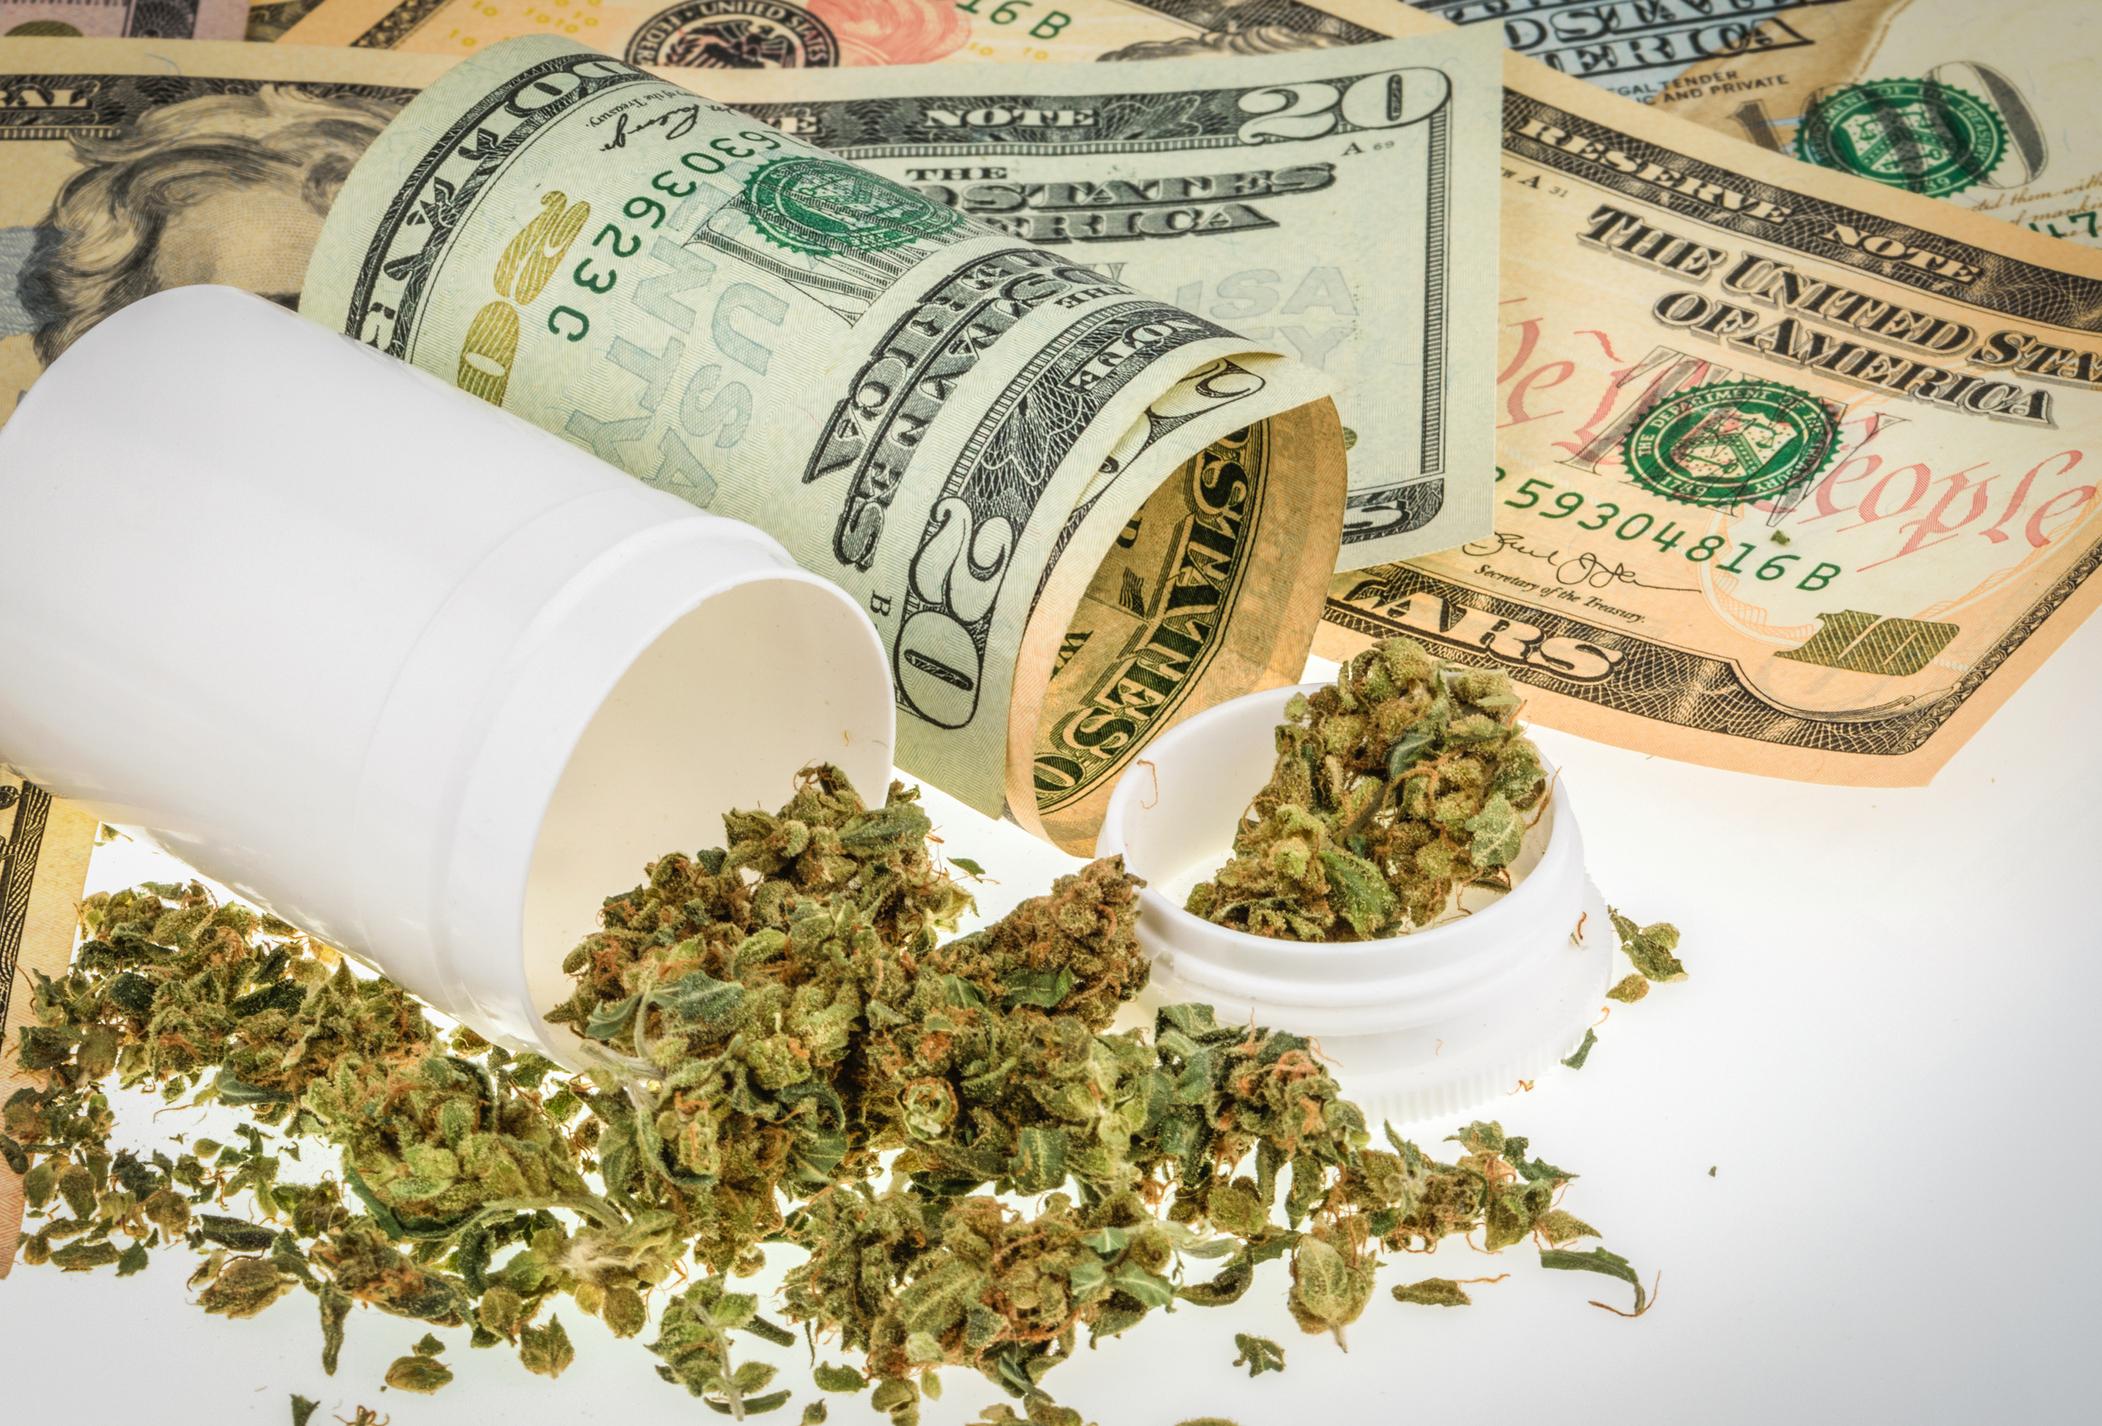 Plastic bottle with marijuana buds and $20 bills